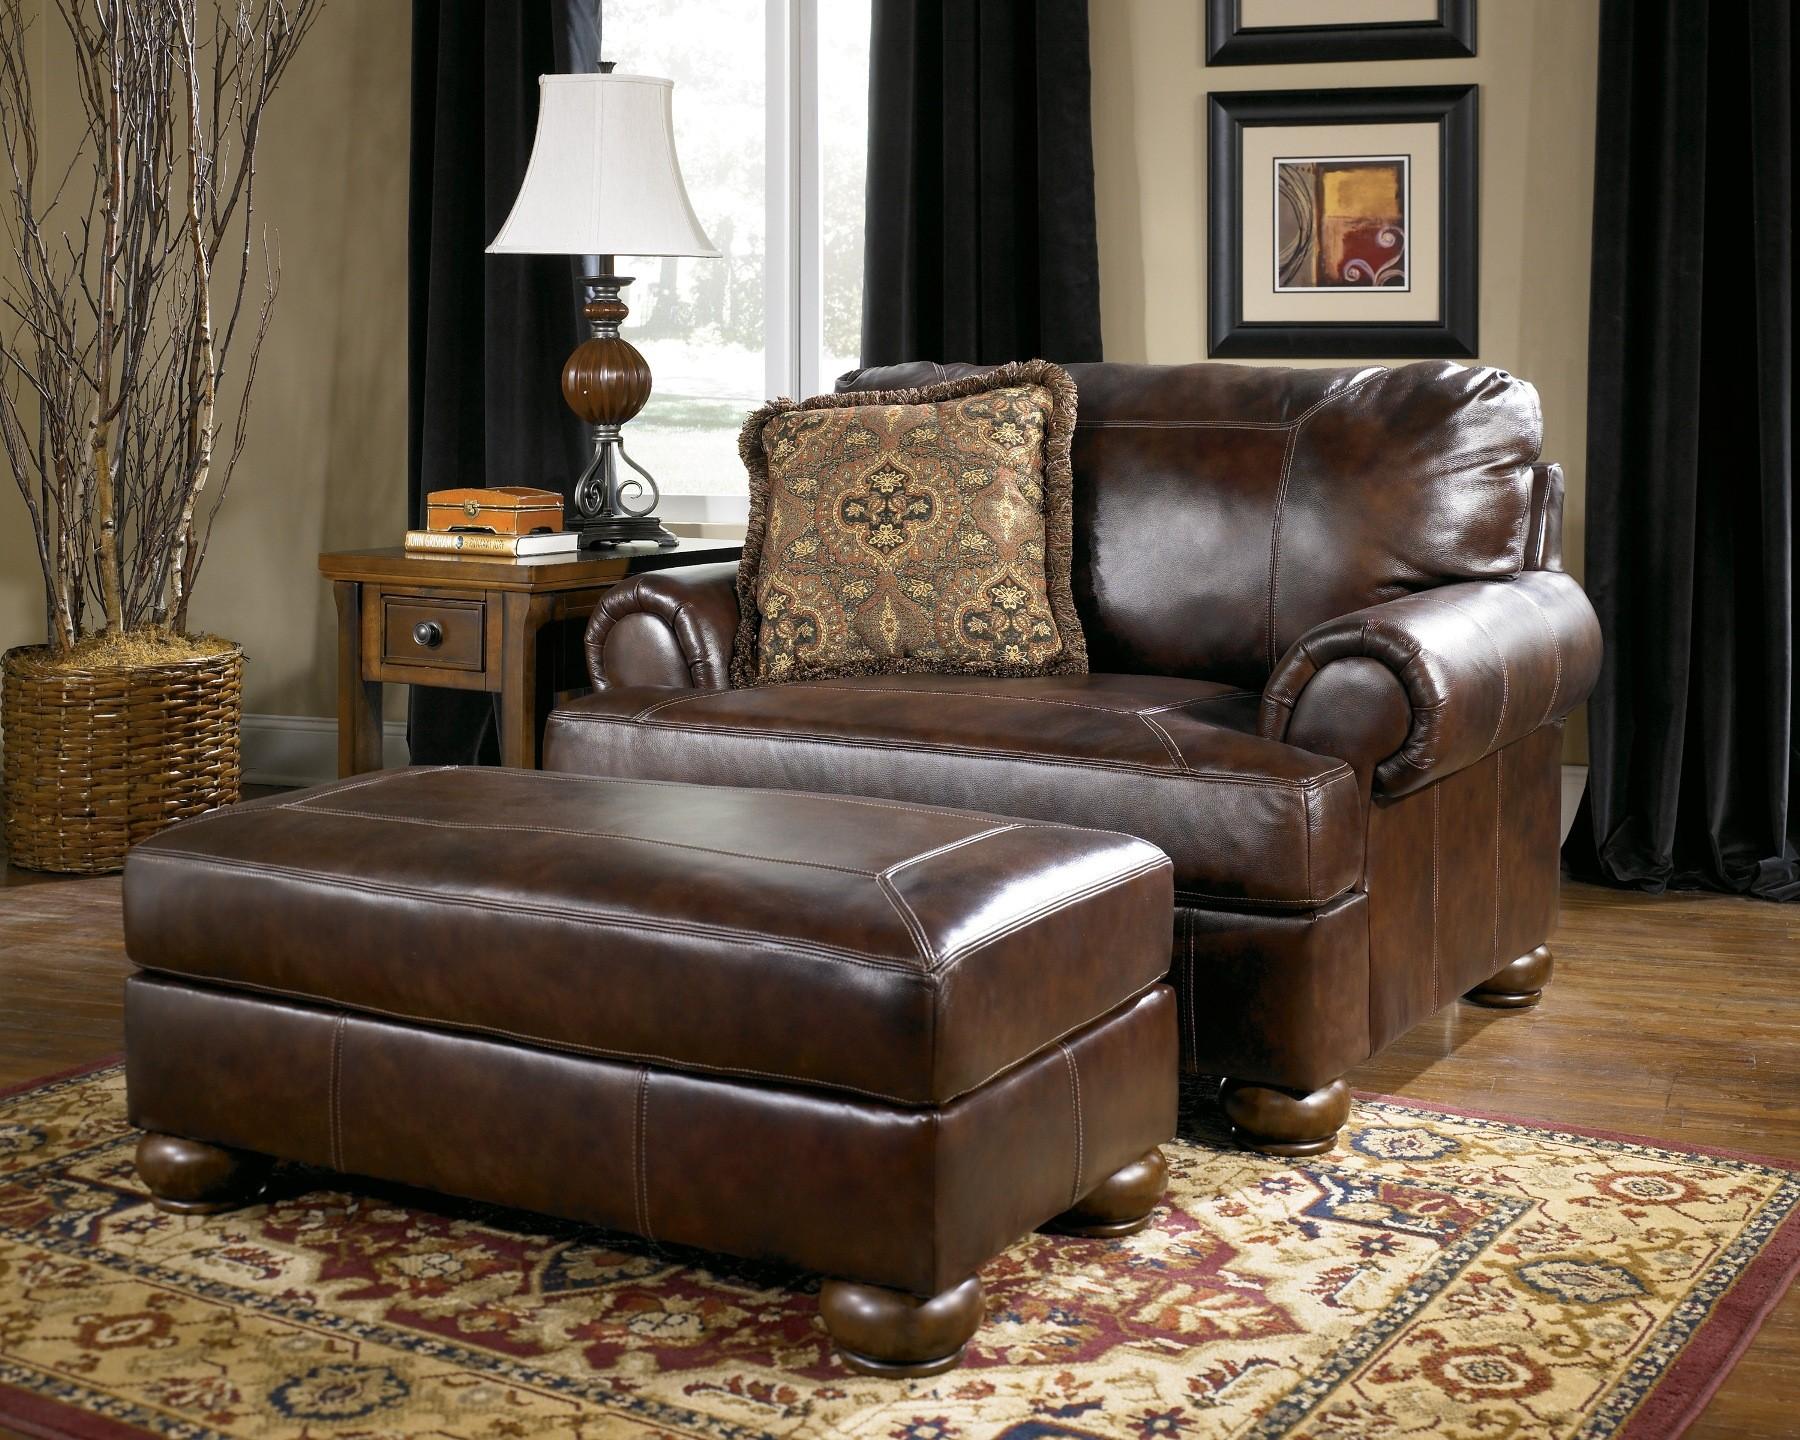 Axiom Walnut Living Room Set from Ashley (42000)